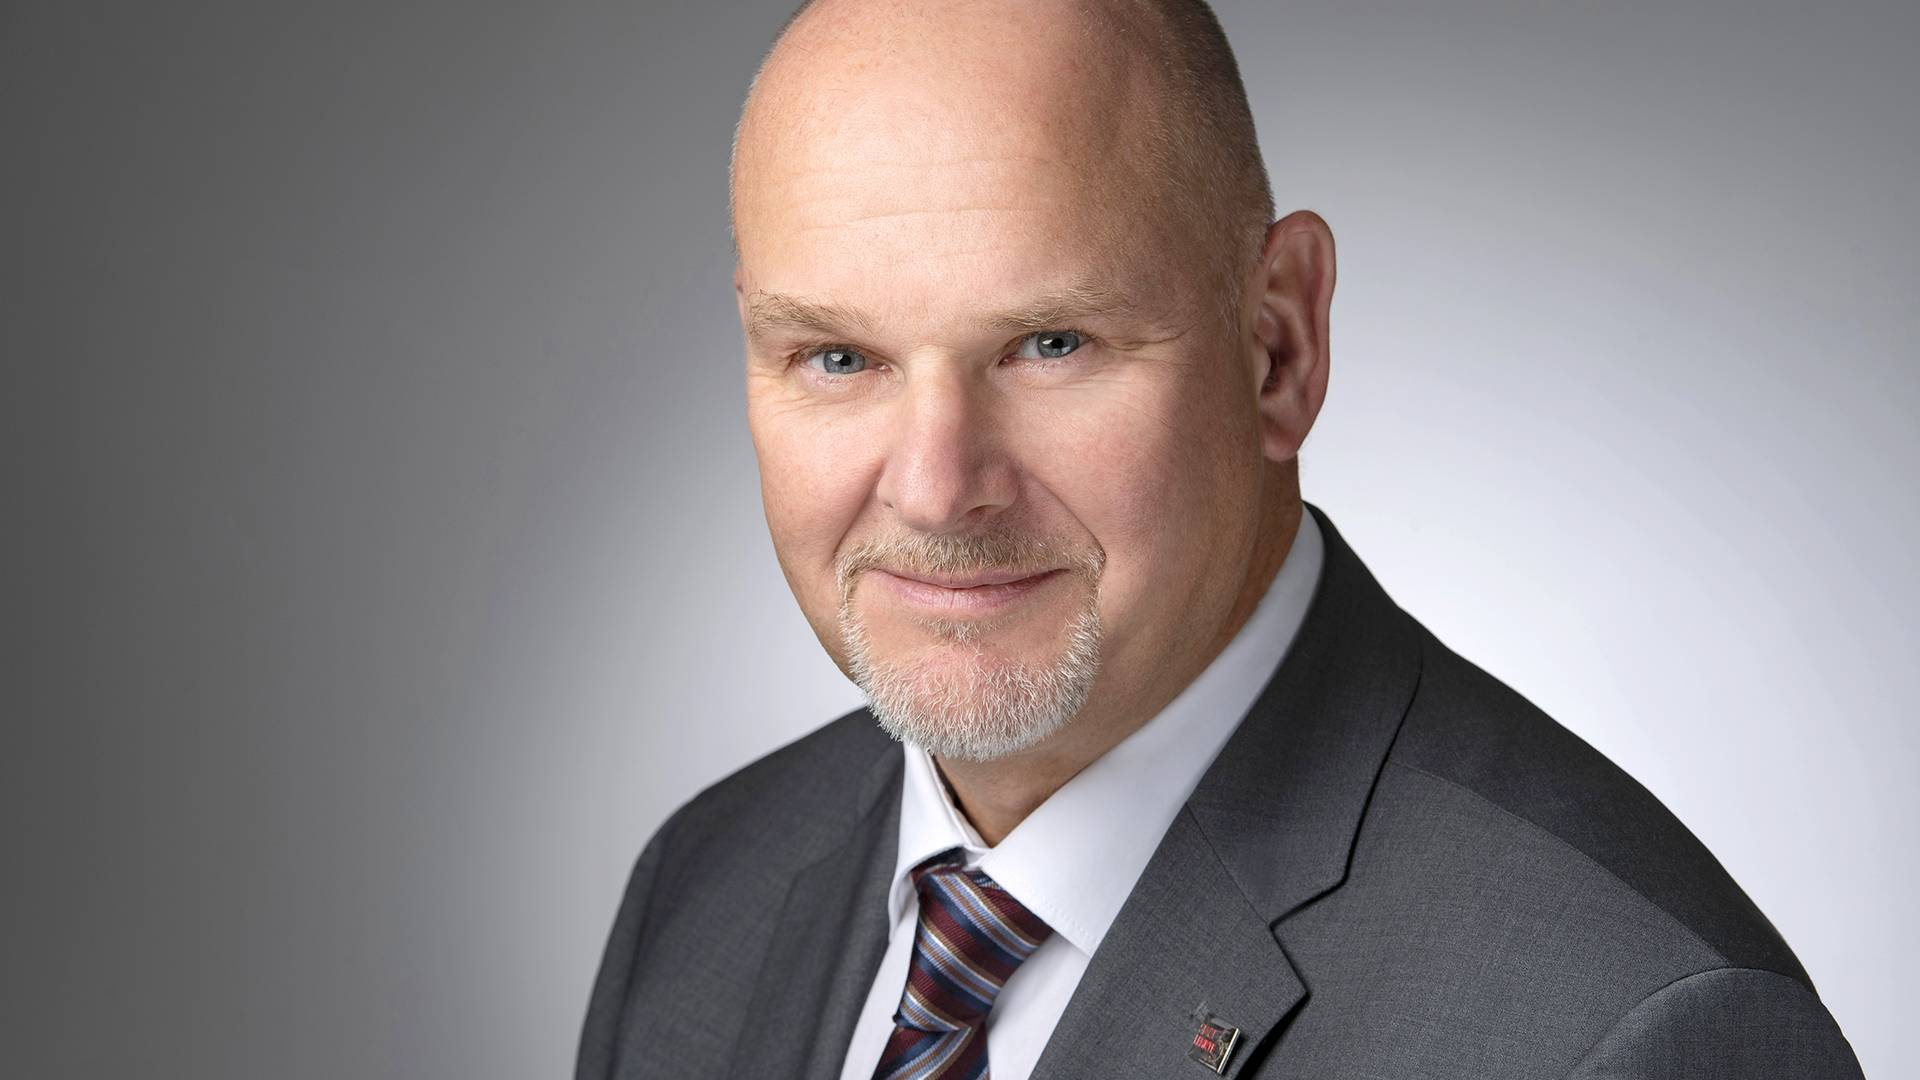 Bürgermeister Frank Prüße